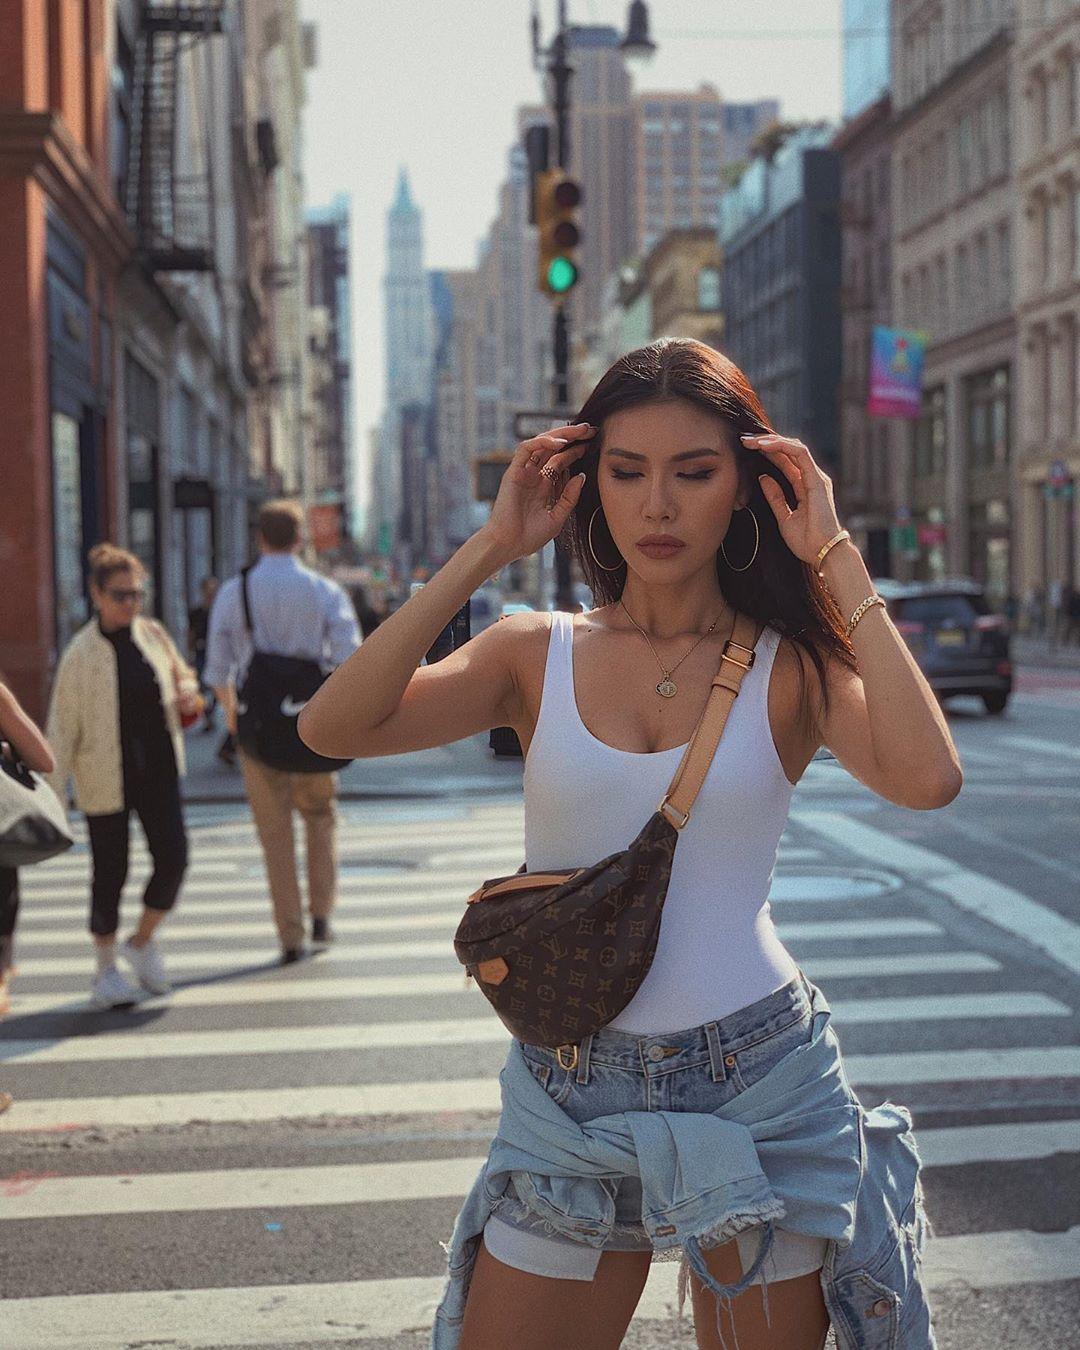 Minh Tú mặc bodysuit màu trắng và quần short jeans